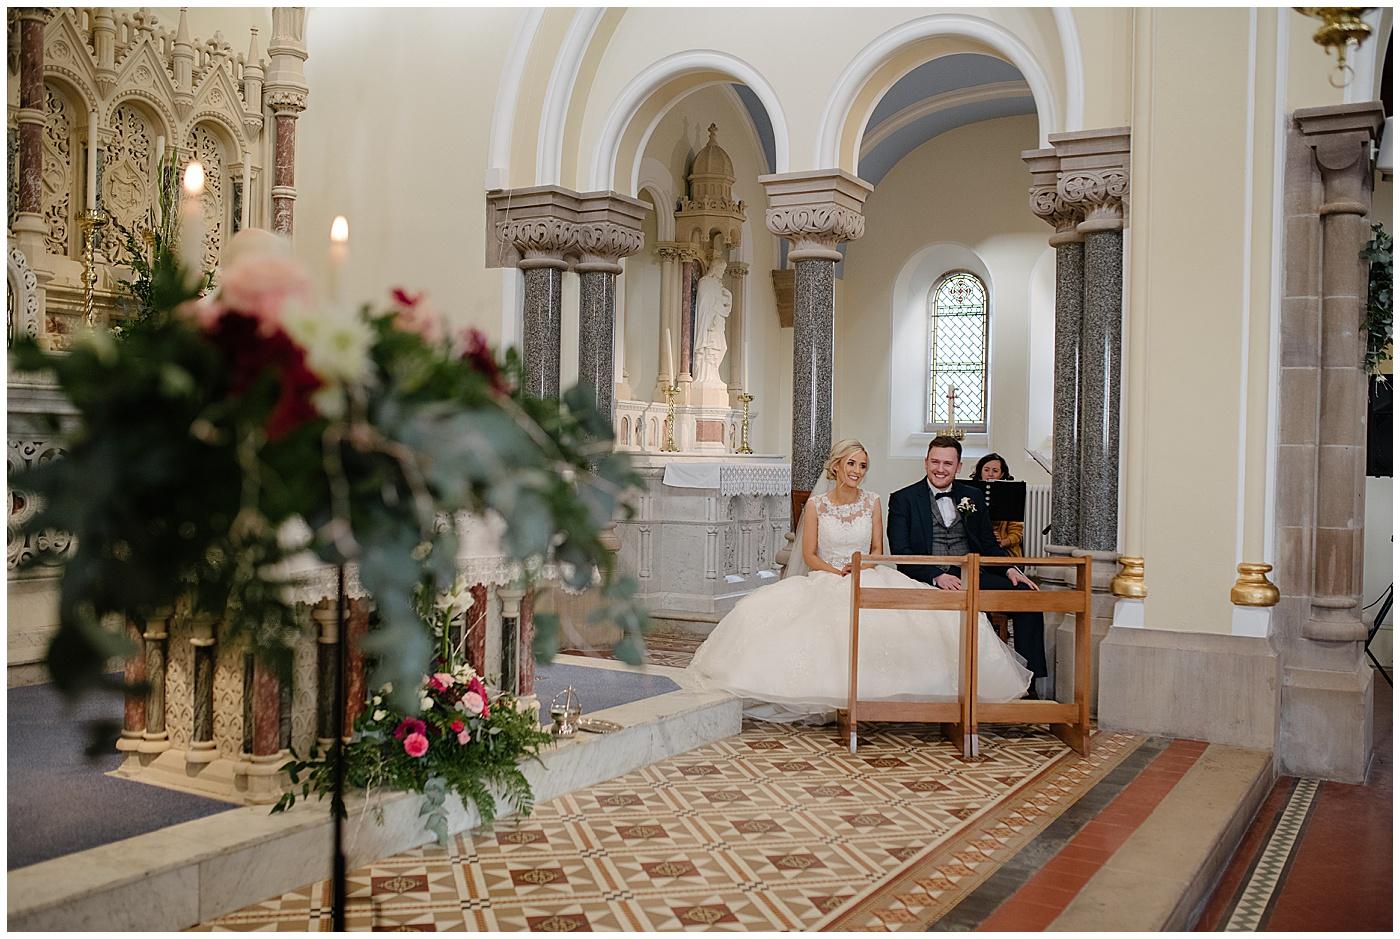 lissan-house-wedding-jude-browne-photography_0035.jpg